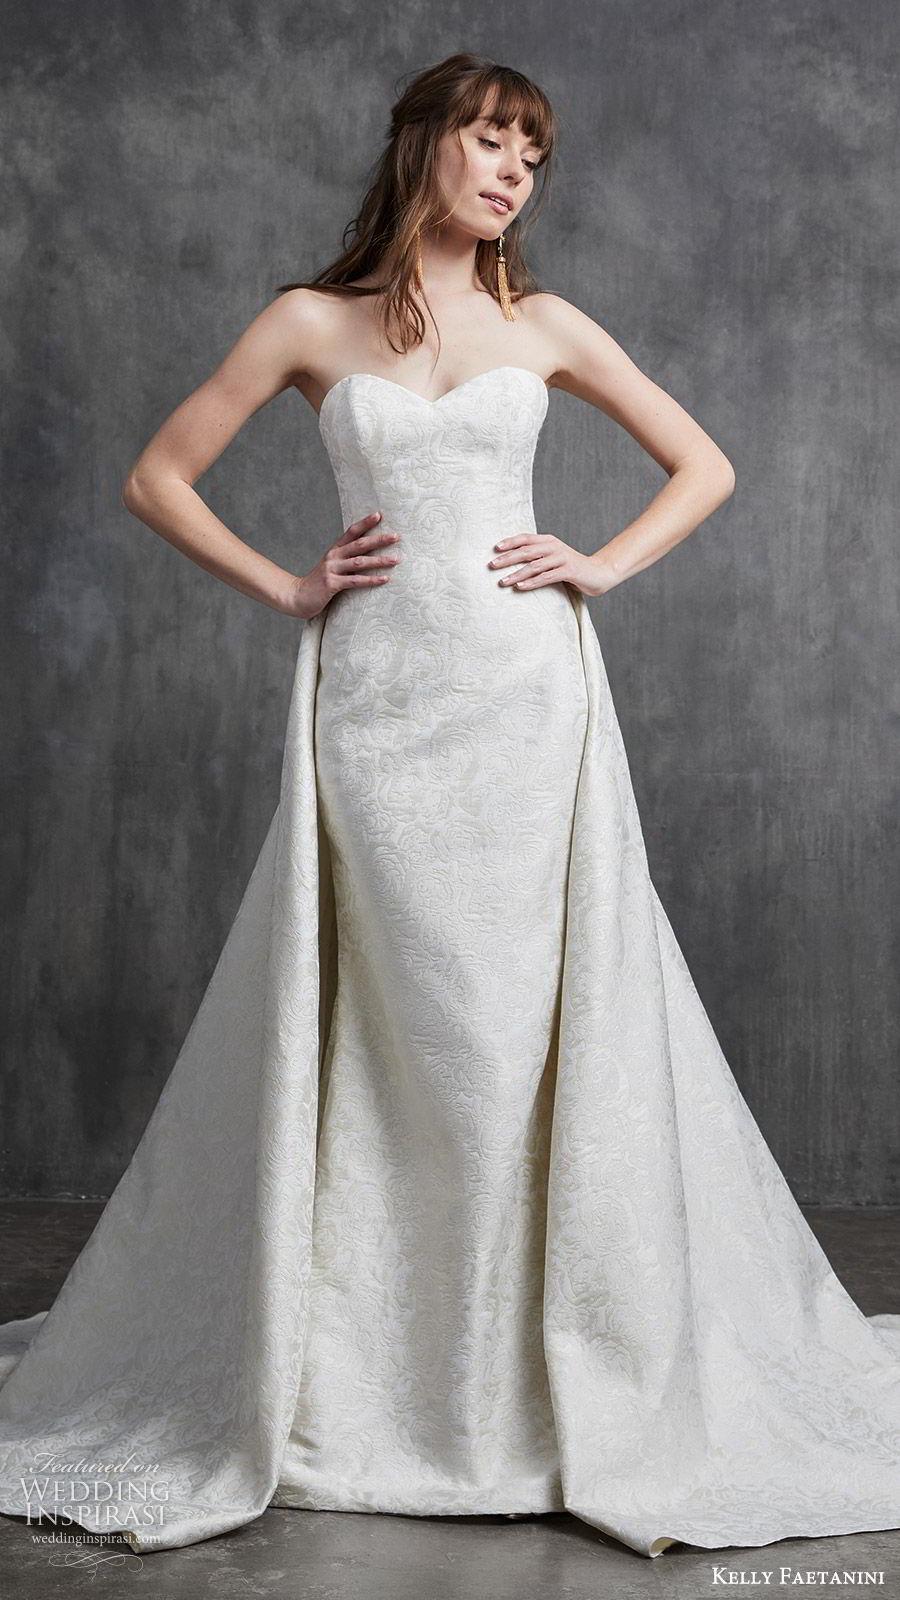 kelly faetanini spring 2020 bridal strapless sweetheart sheath mermaid embellished wedding dress (9) a line overskirt chapel train elegant classic mv